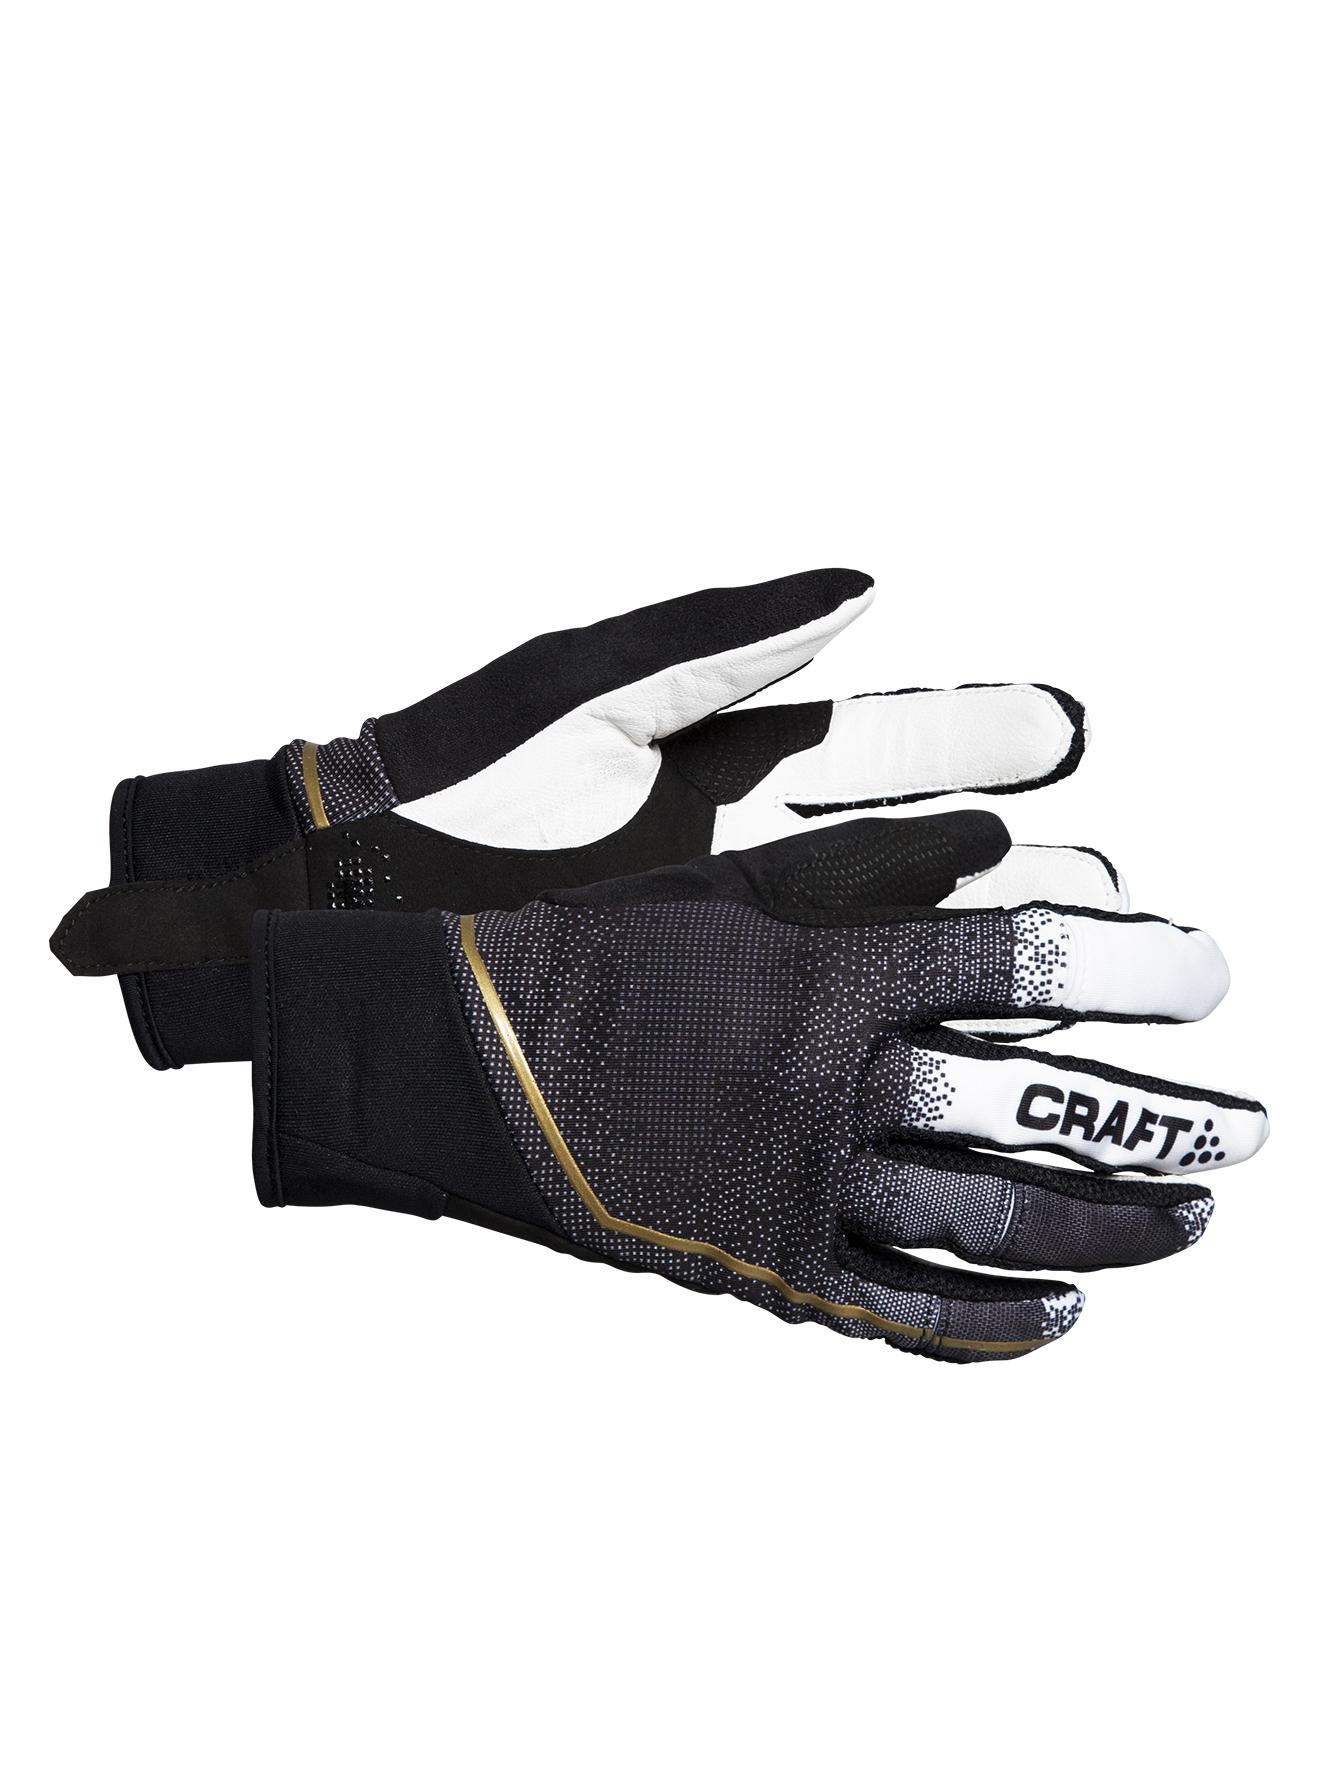 1903584_9900_podium_leather_glove_F.jpg